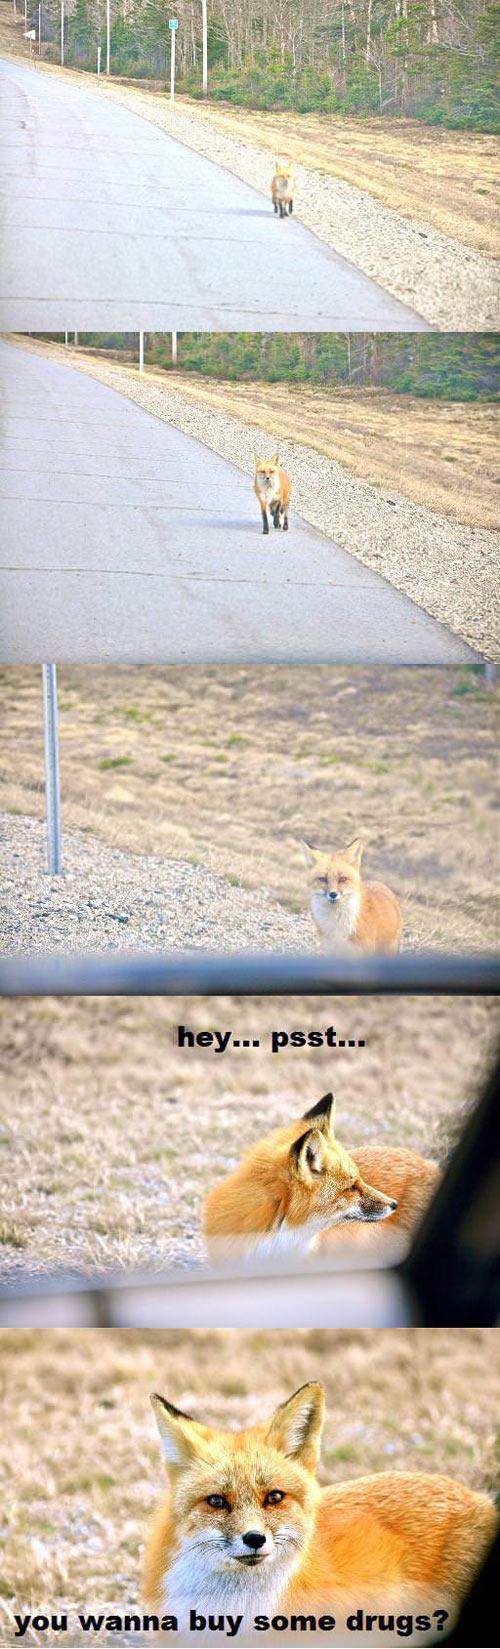 funny-fox-road-walking-selling